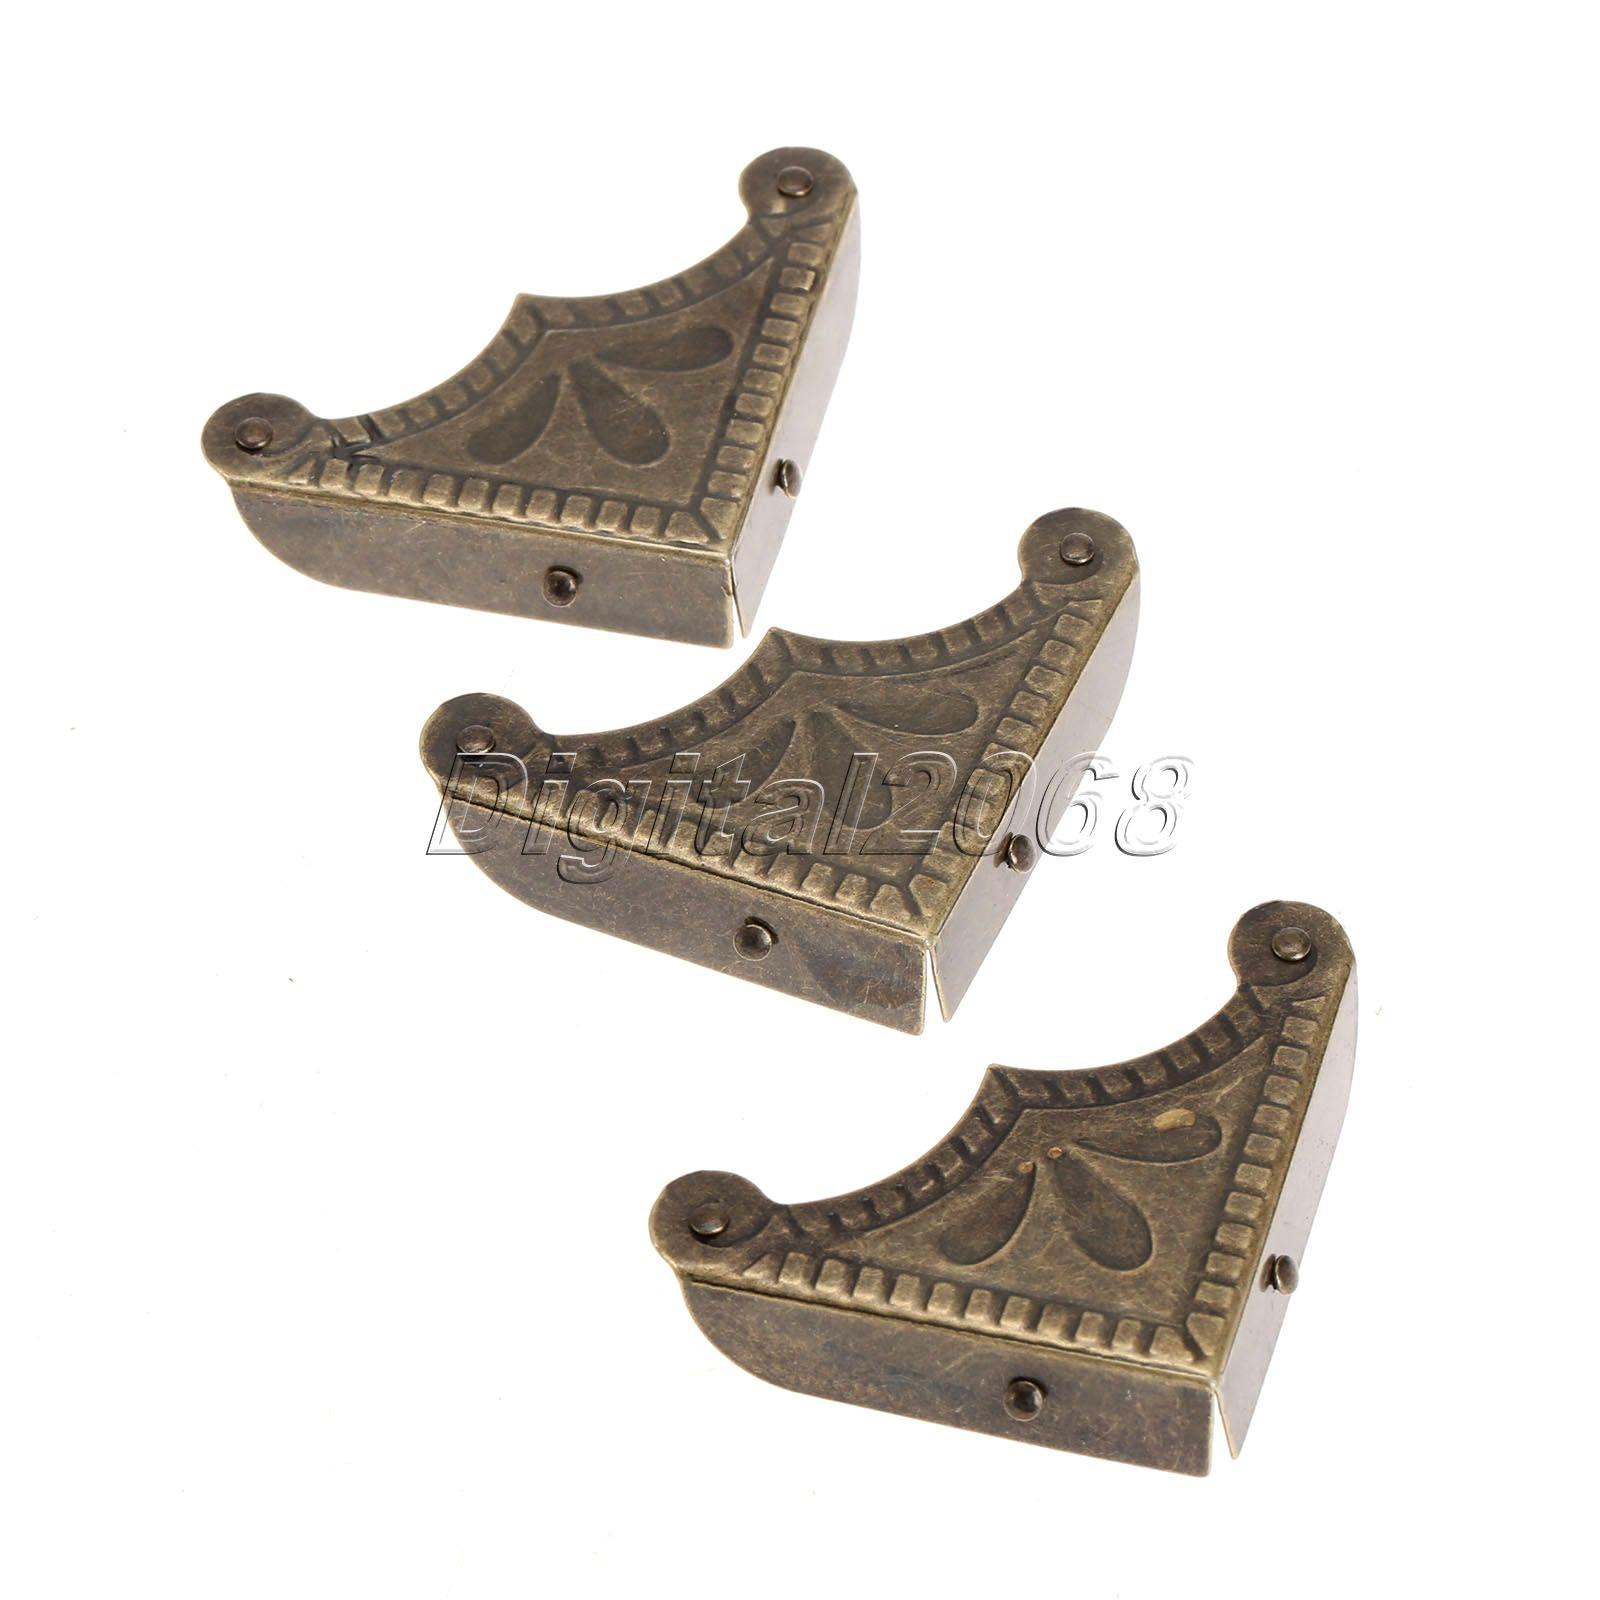 Hot Sale 12pcs Corner Brackets Antique Brass Jewelry Wine Gift Box Wooden Case Chest Edge Cover Corner Protector Guard +Screws